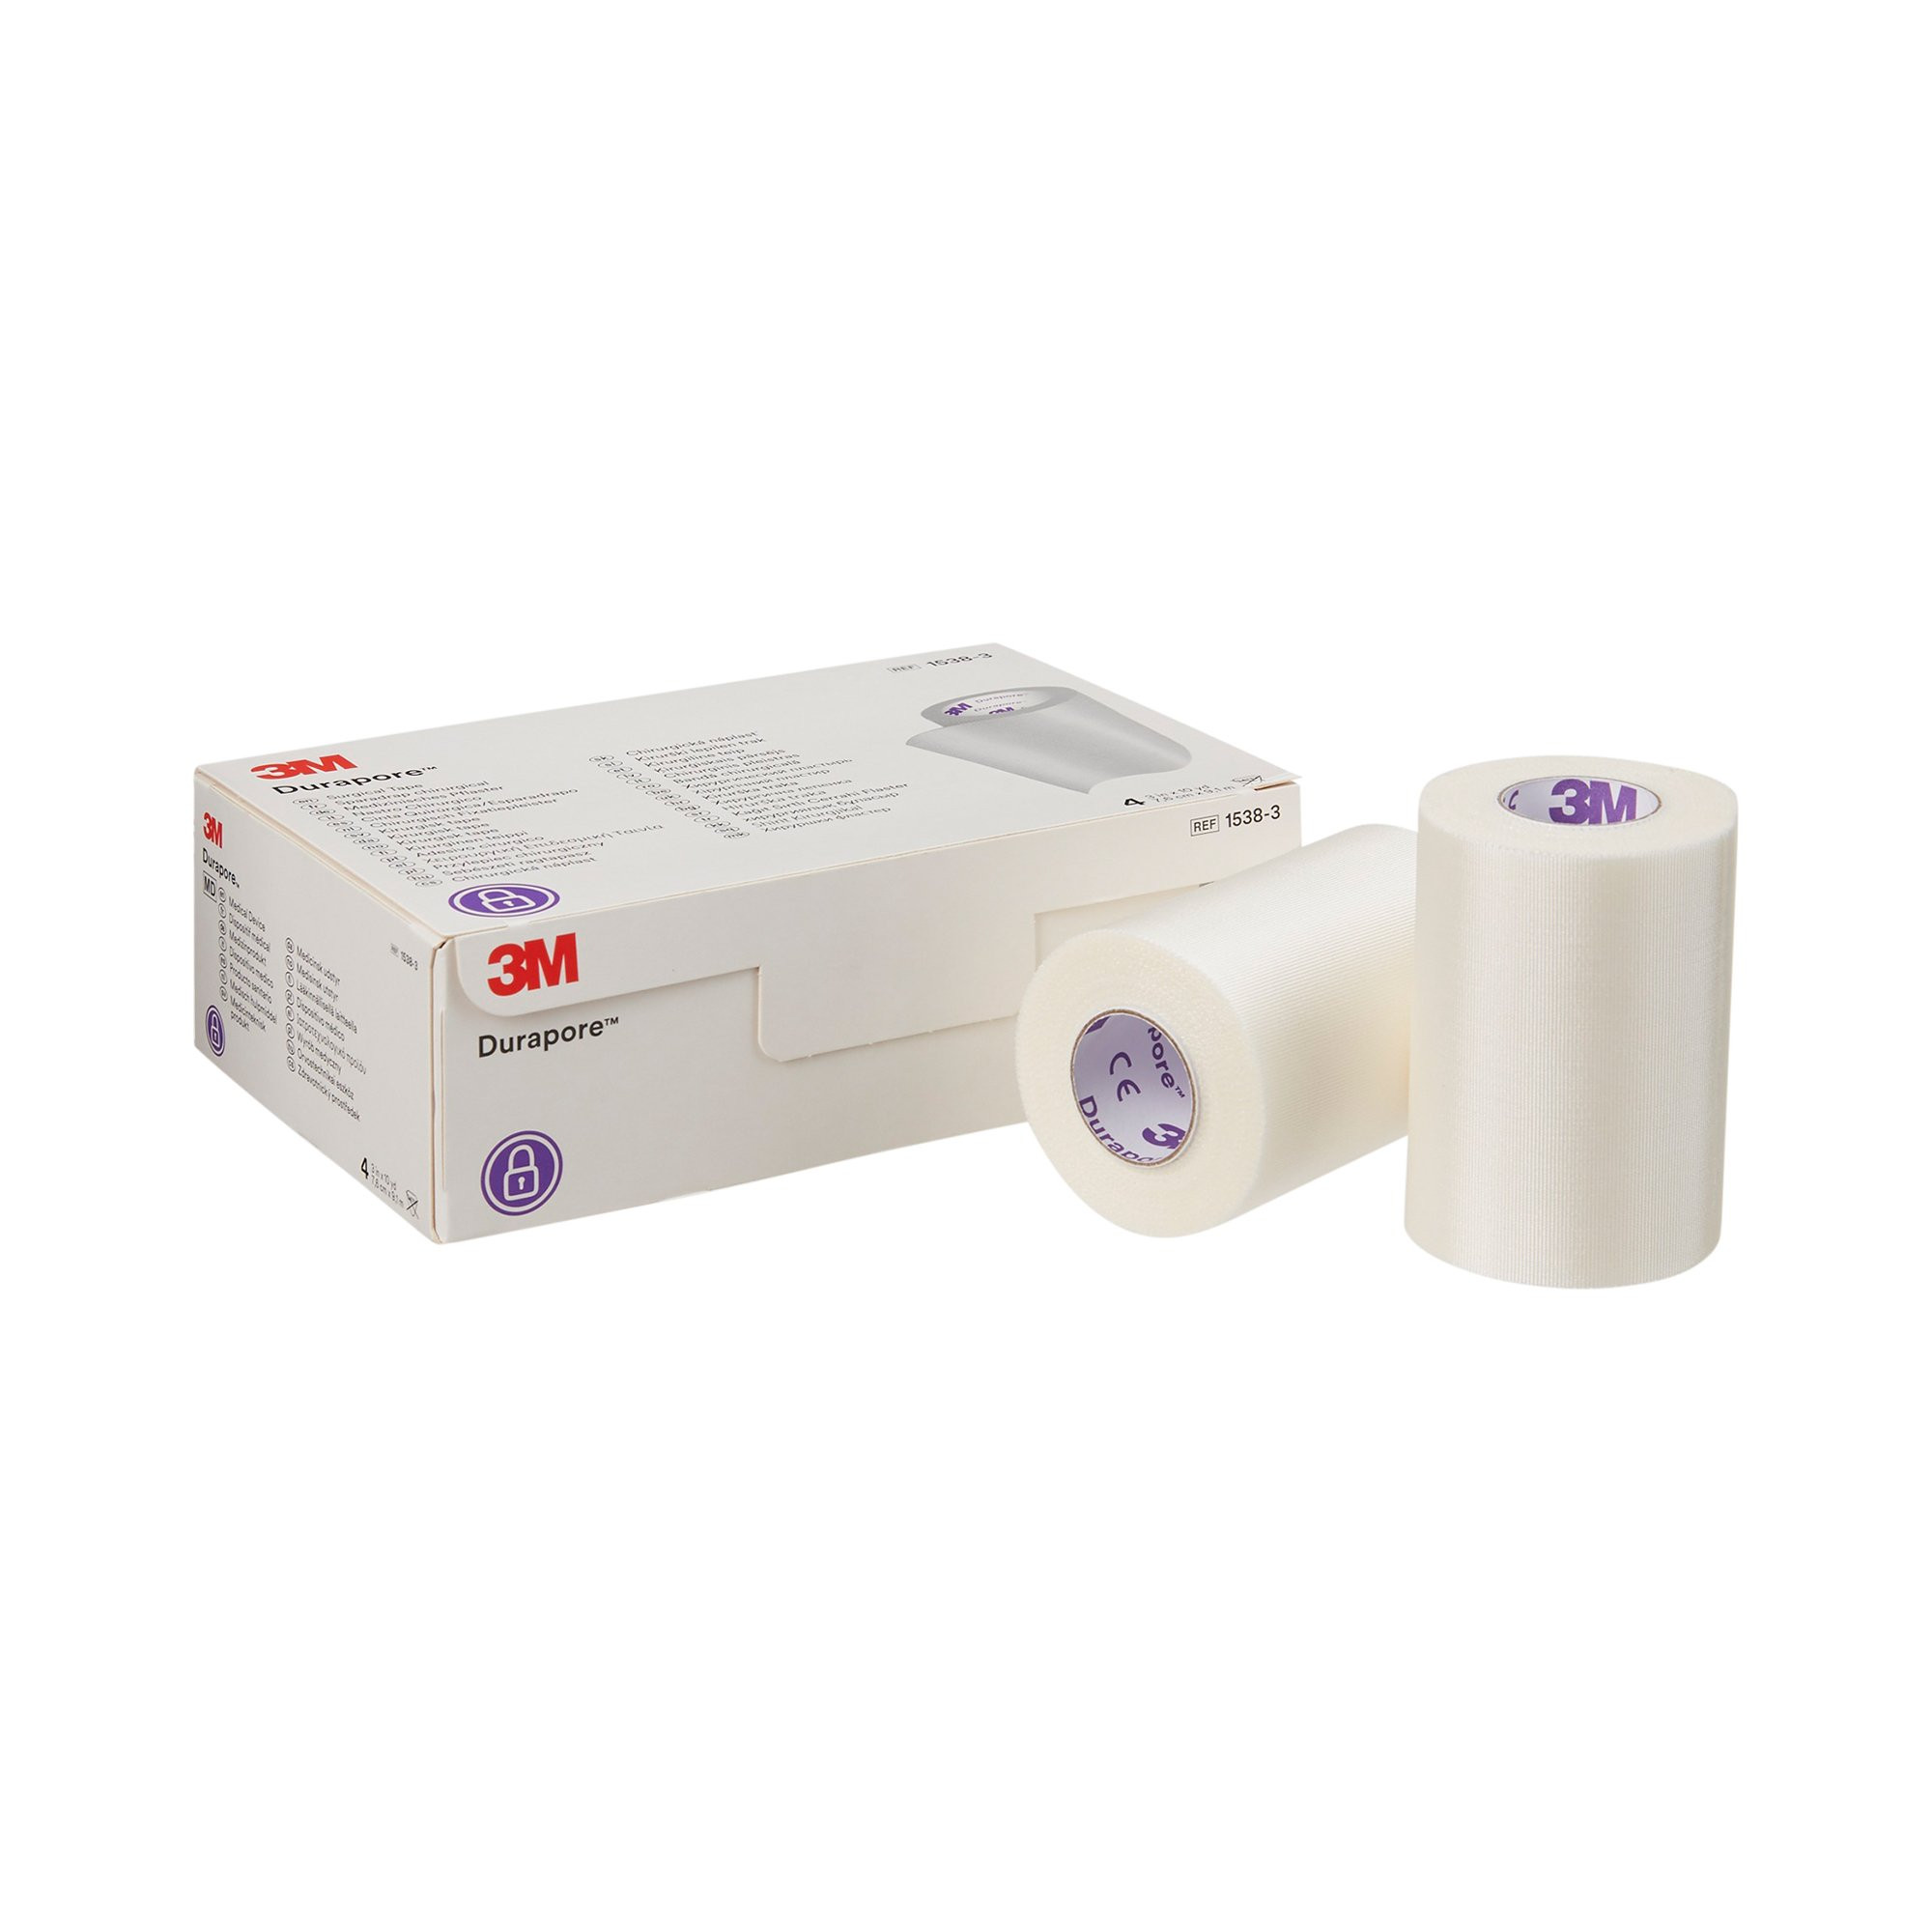 "3M Durapore Silk-Like Cloth Medical Tape, 3"" x 10 yd, 1538-3, Box of 4"